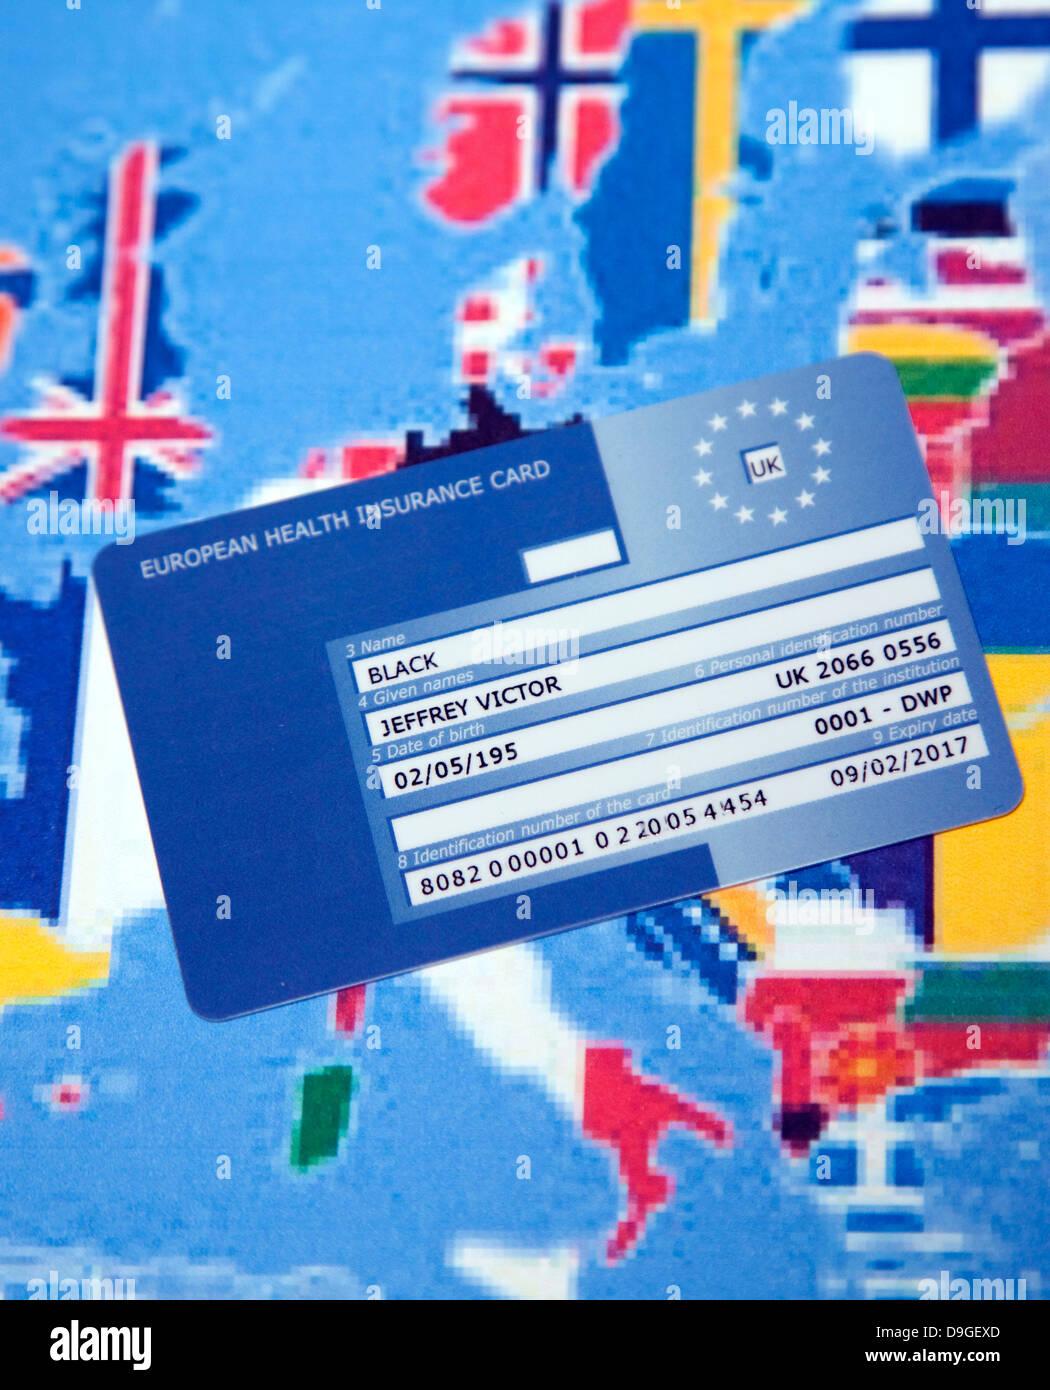 health insurance london  European Union Health Insurance Card (EHIC), London Stock Photo ...